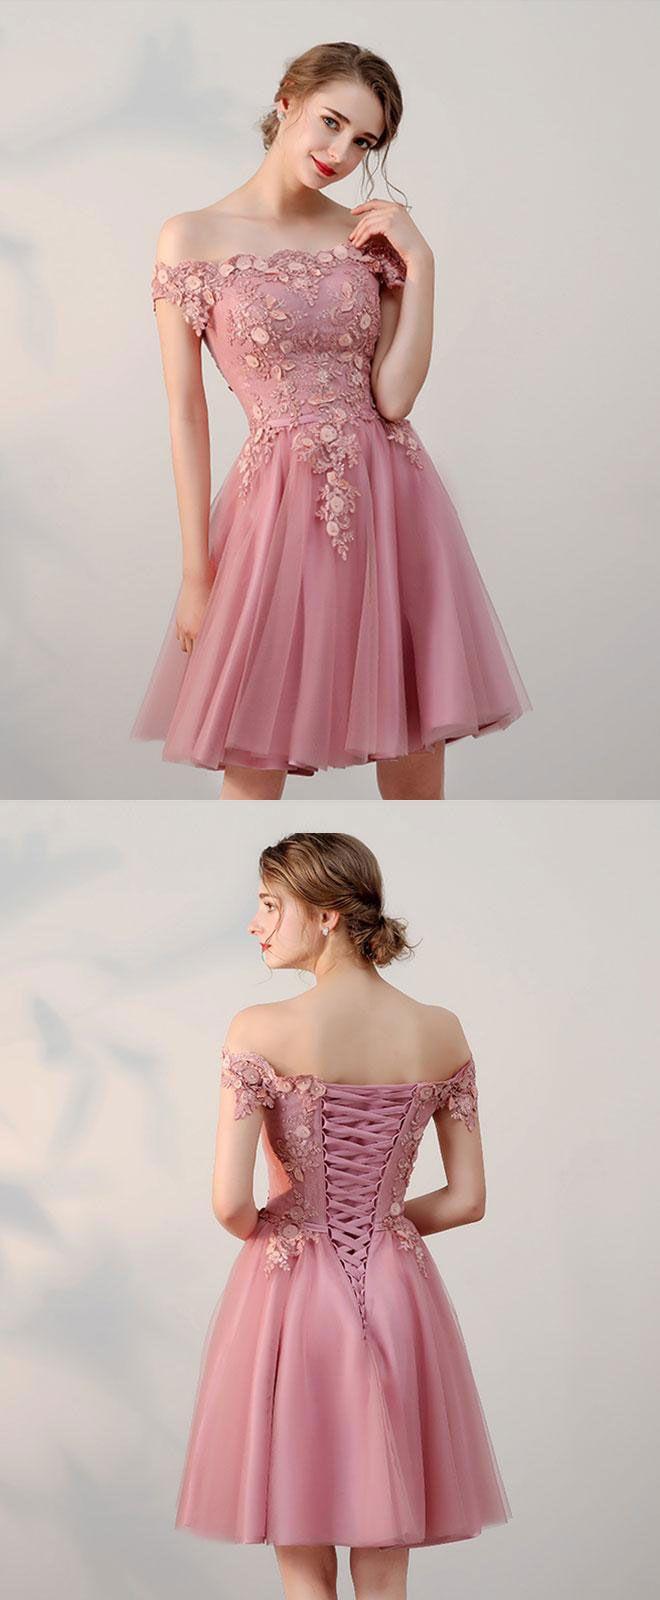 Pink Western Prom Dresses